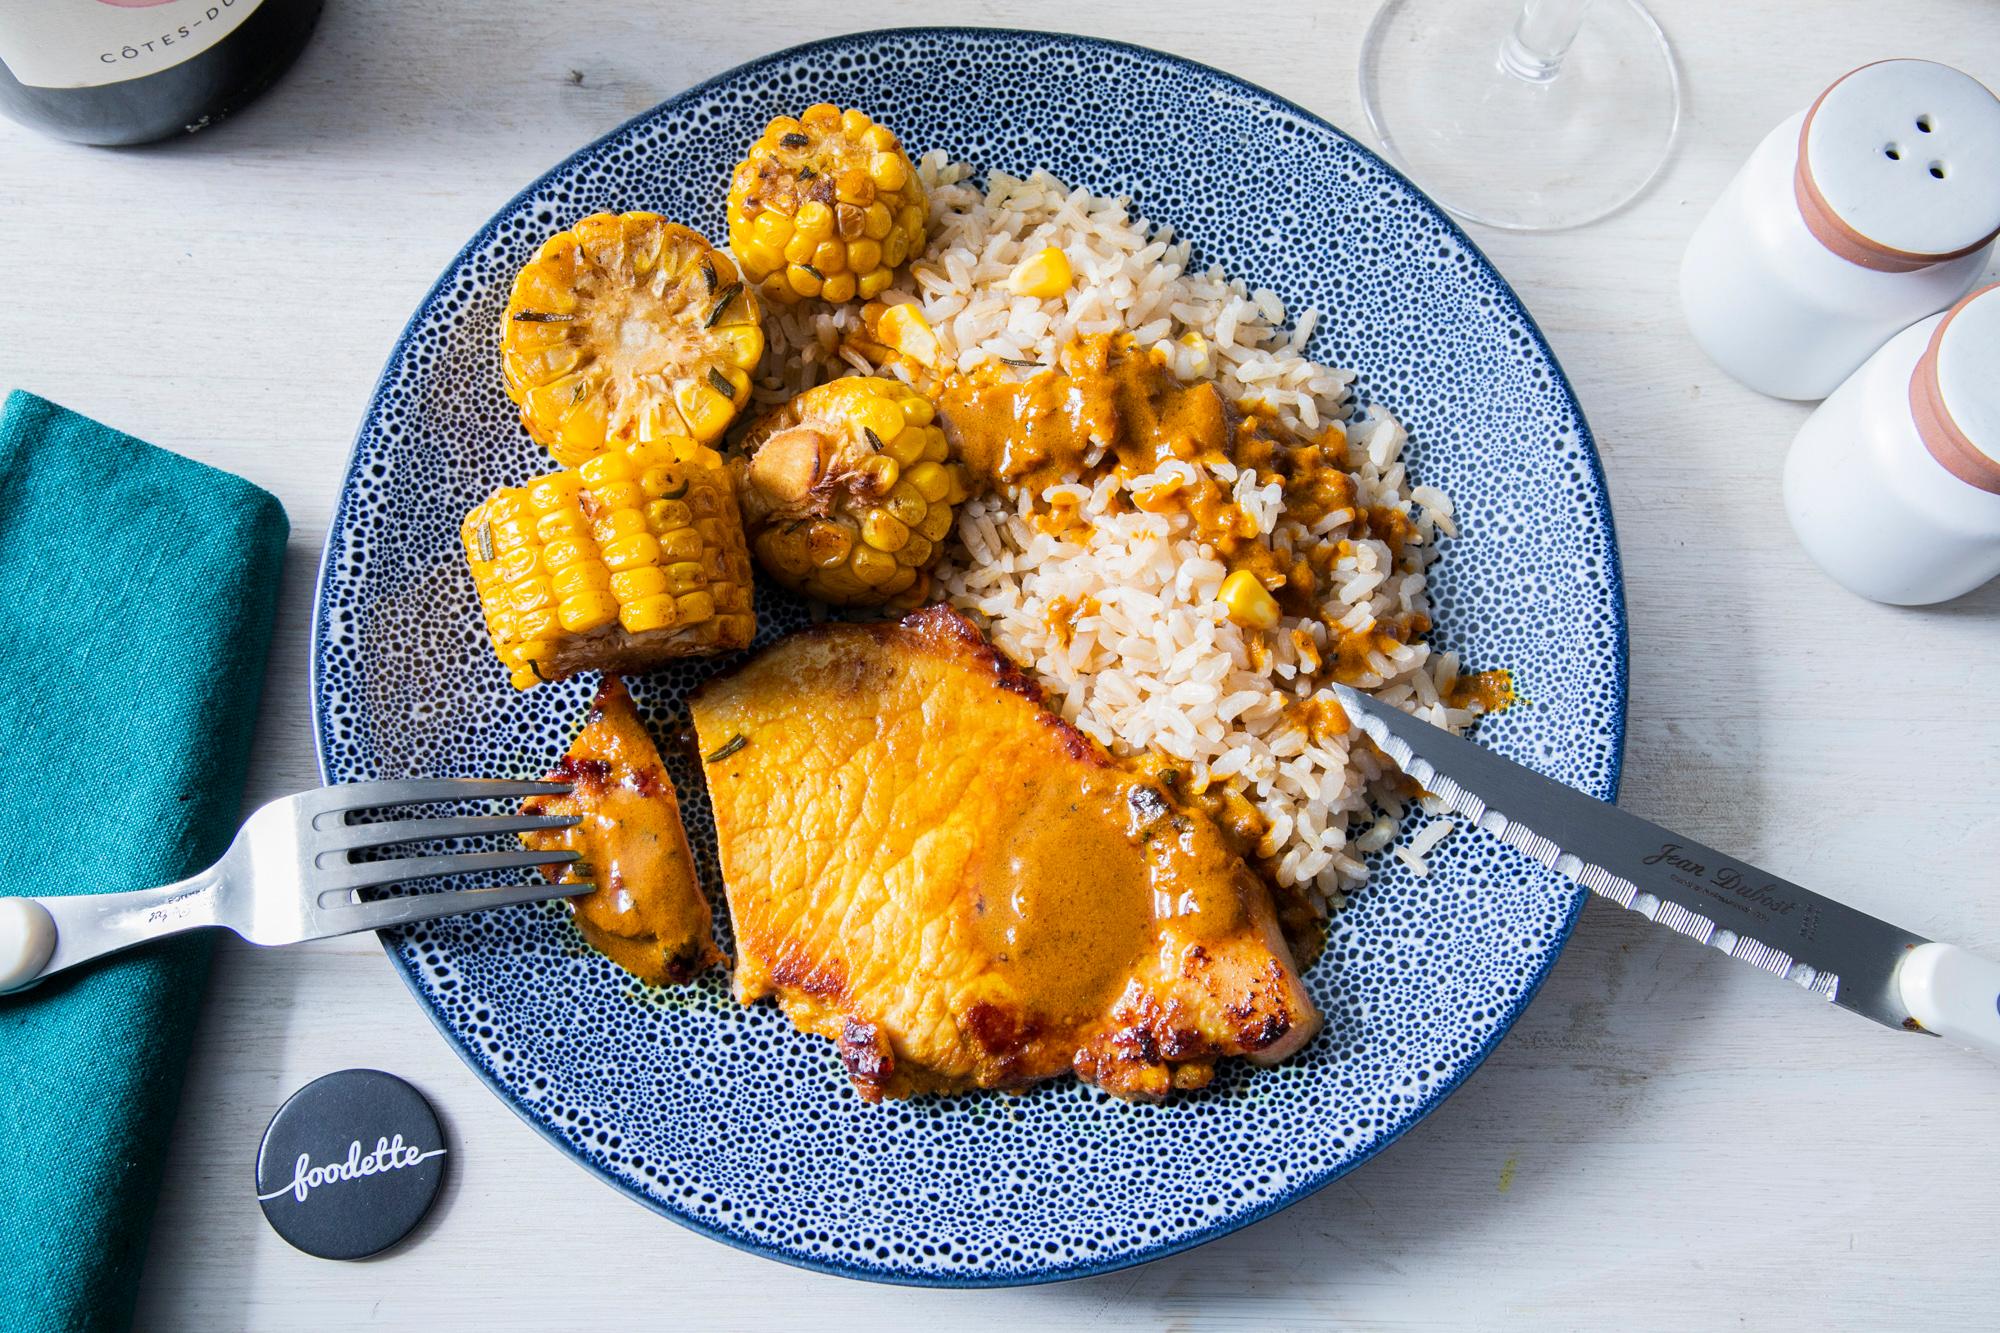 Porc au curcuma, riz et maïs grillé